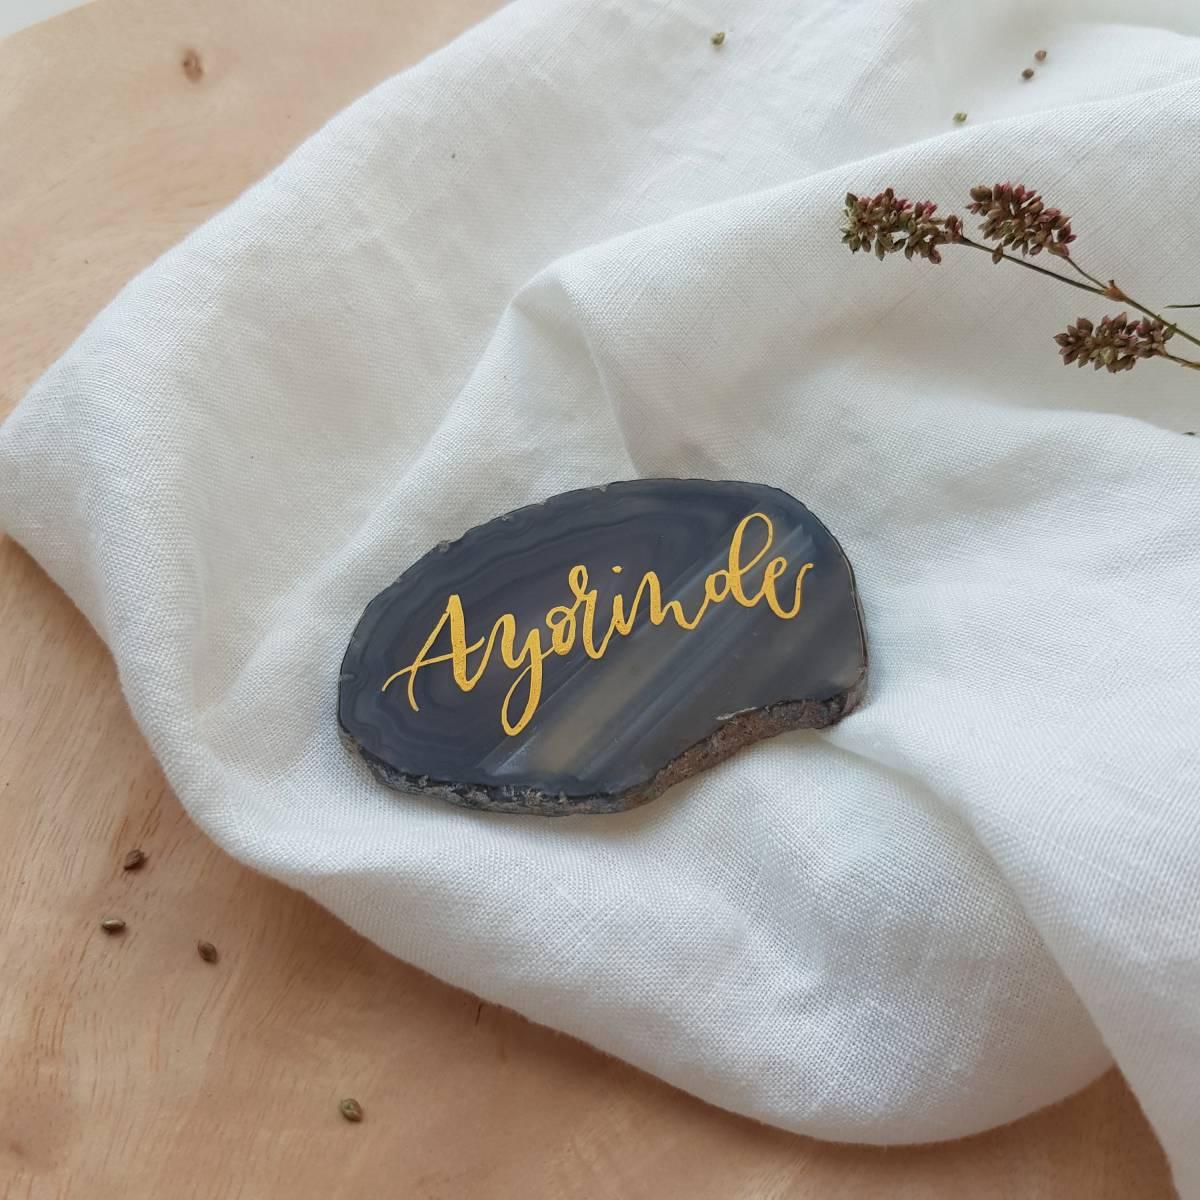 Touch of Gold - Trouwuitnodiging - Huwelijksuitnodiging - Kalligrafie - House of Weddings - 5